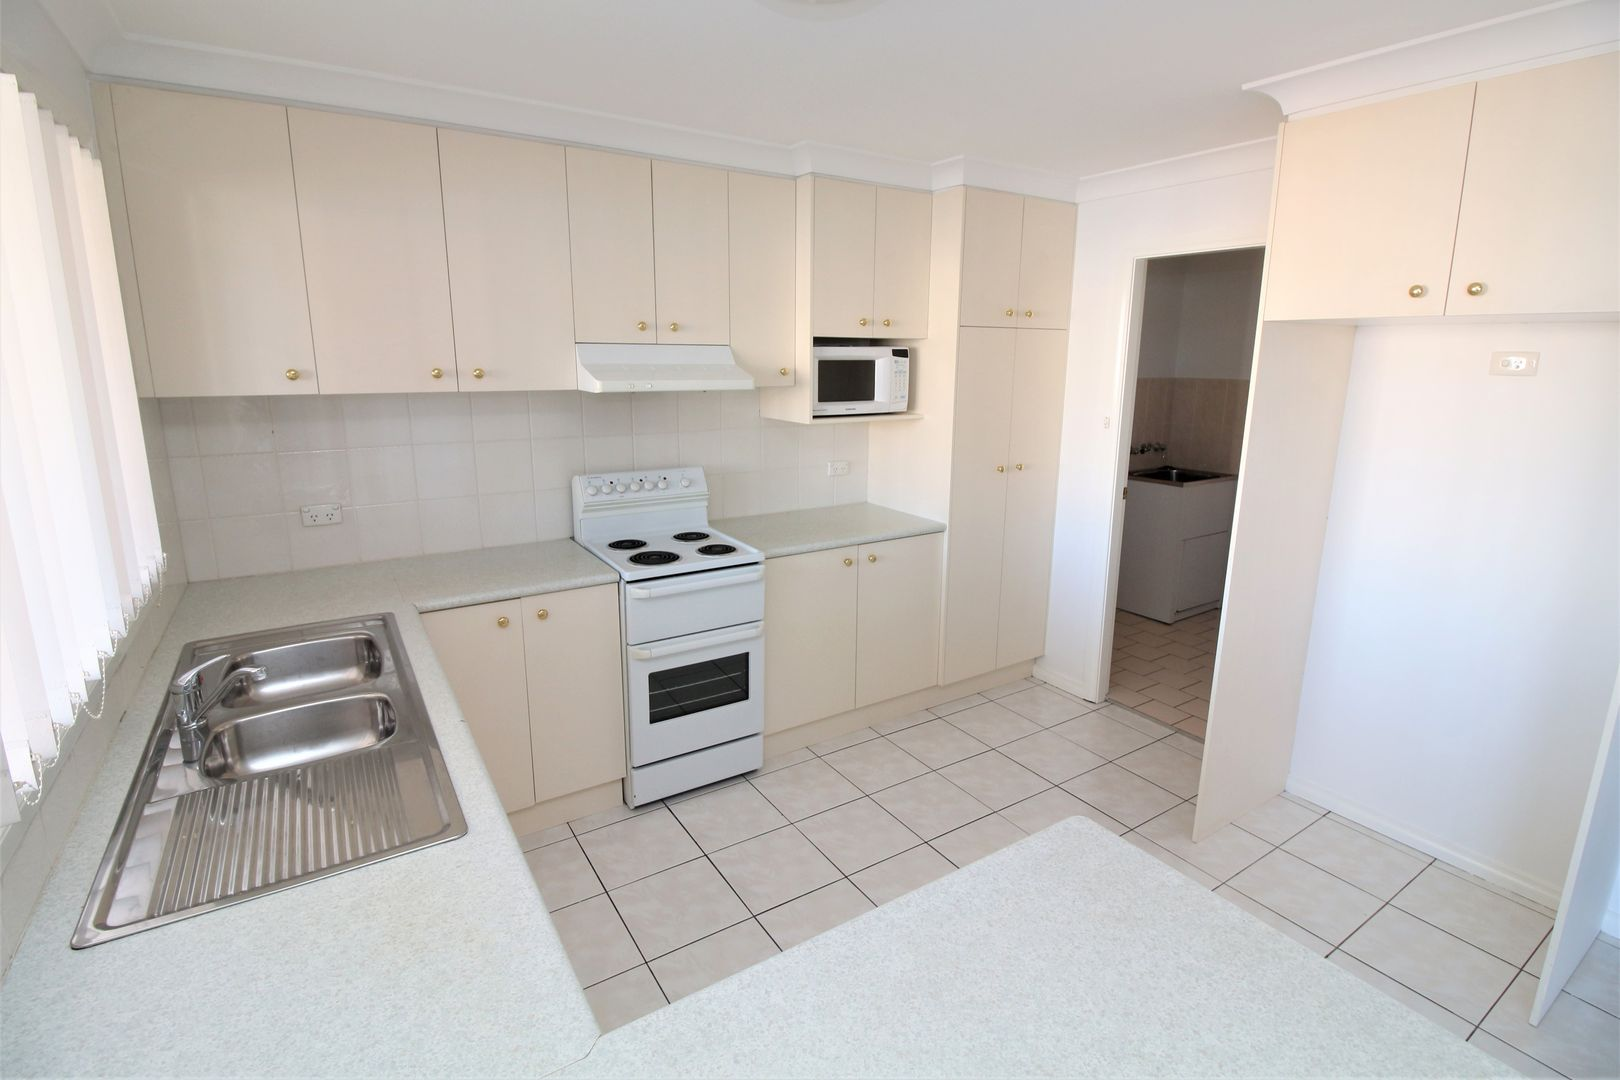 3/490 Banna Avenue, Griffith NSW 2680, Image 0